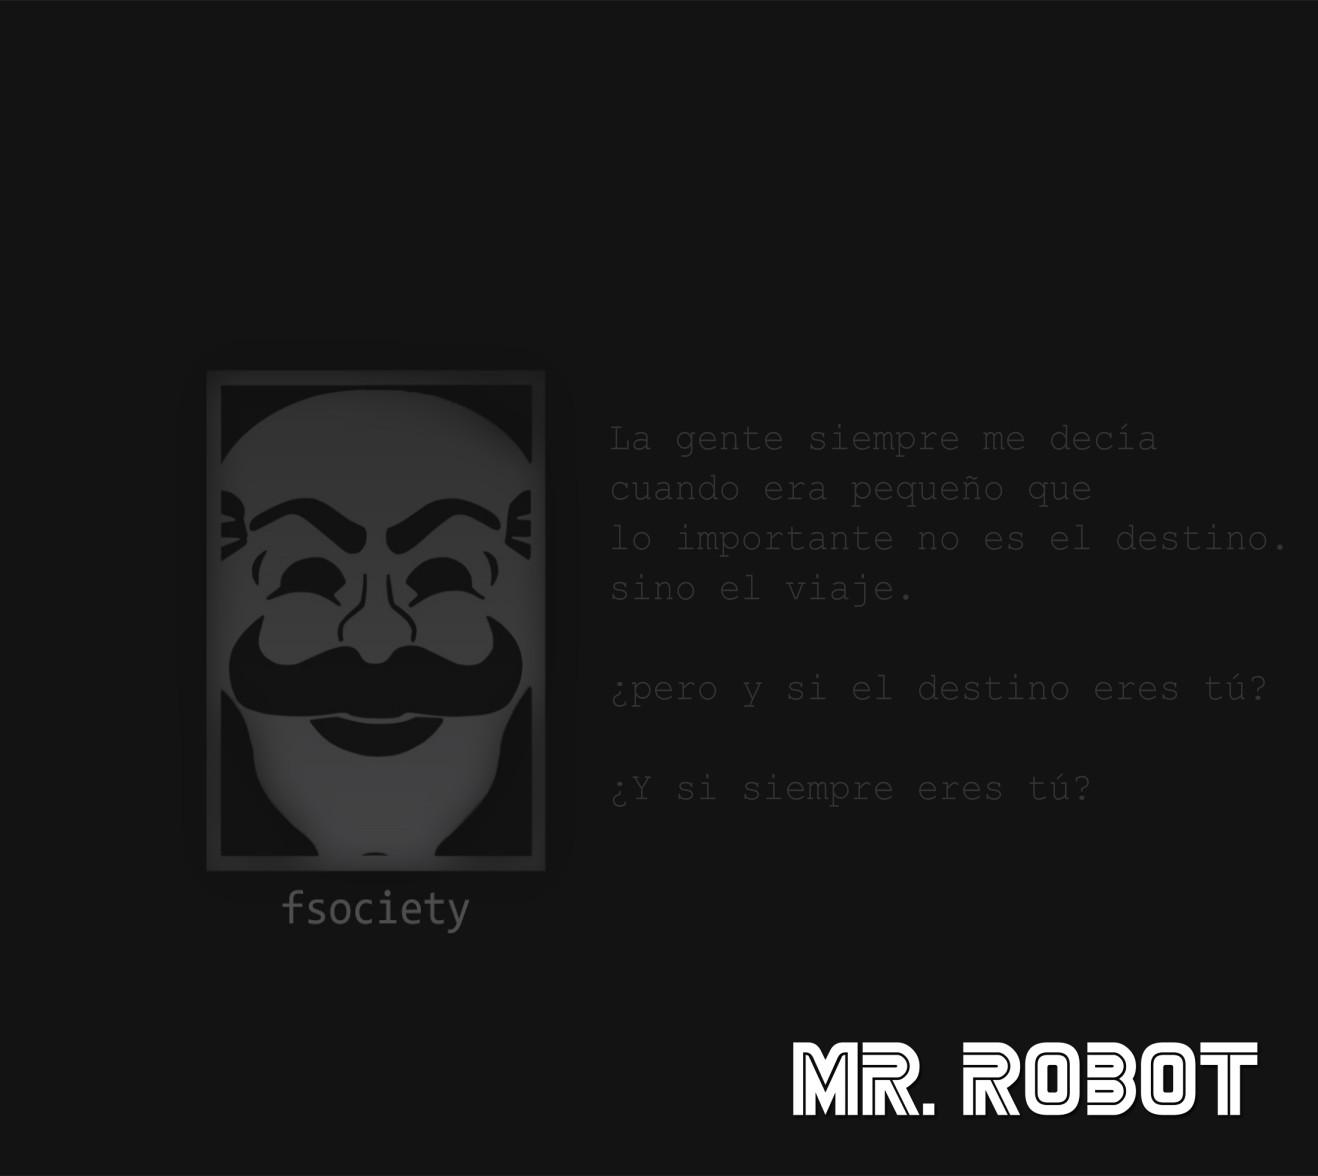 Papel De Parede 1318x1176 Px Fundo Preto Sociedade Hacking Sr